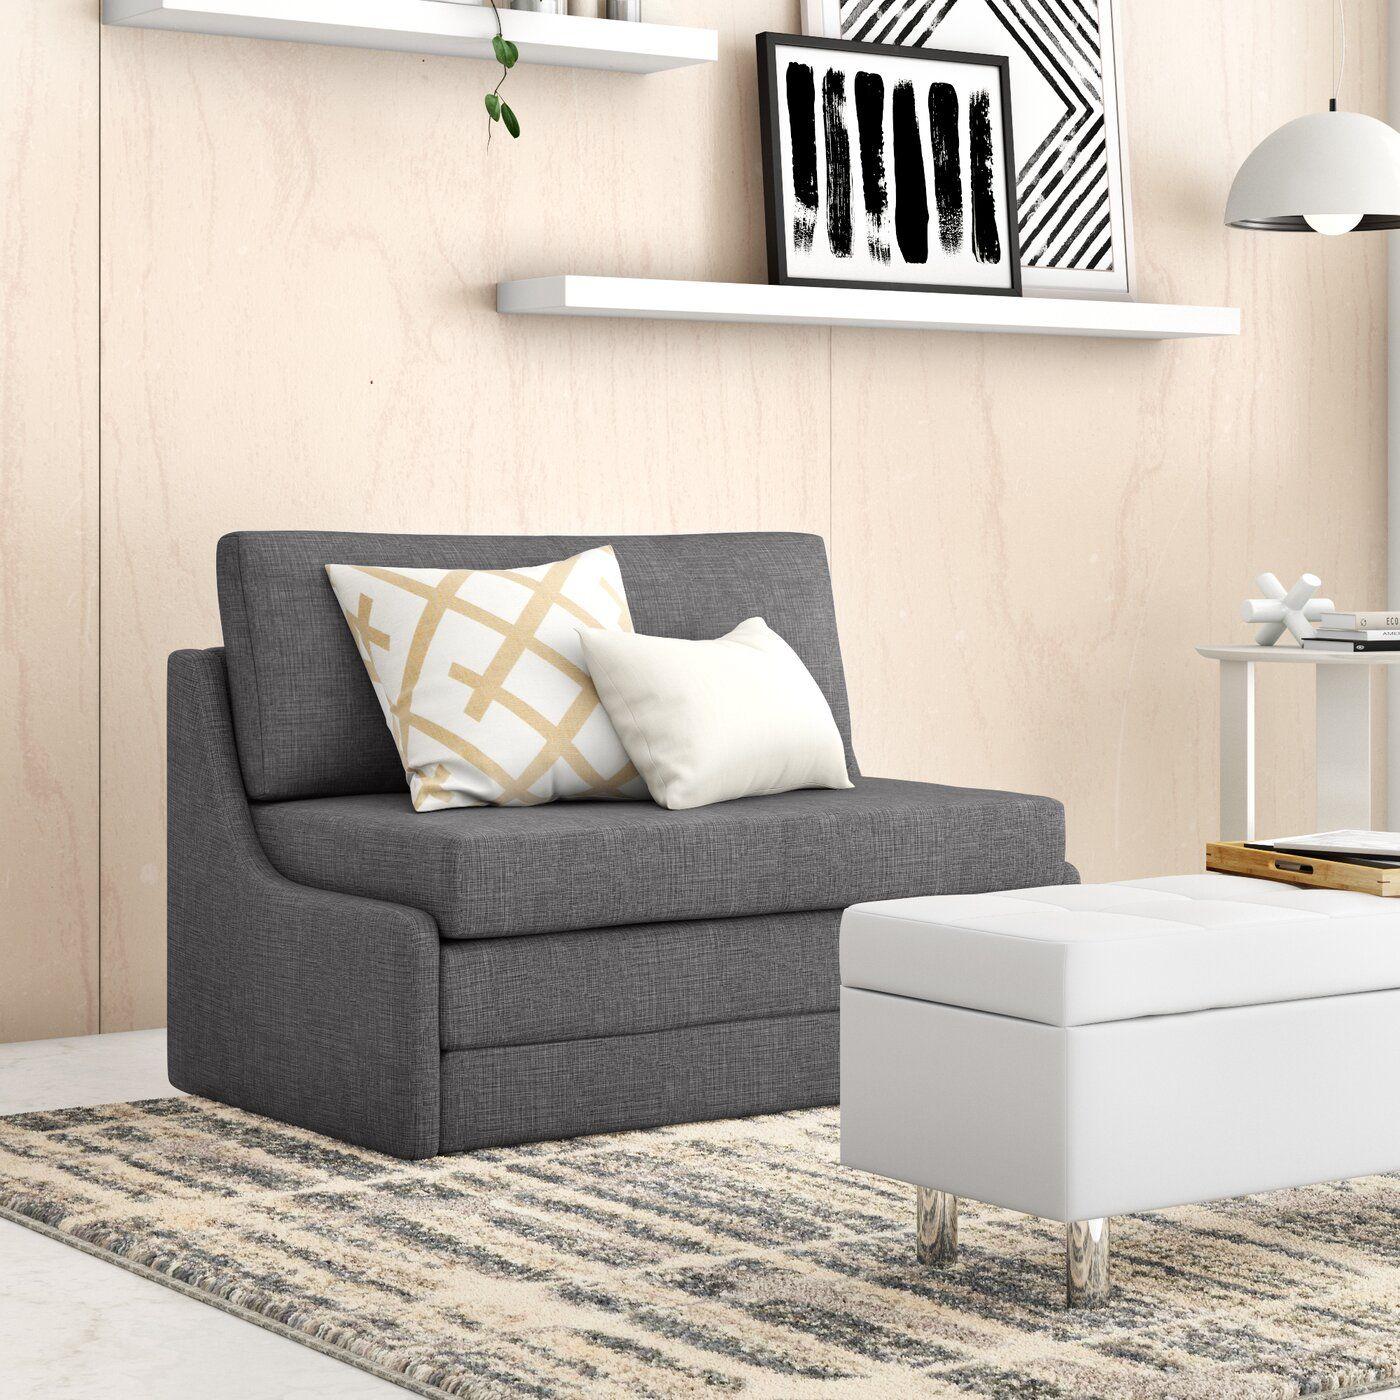 "Sabine 43.31"" Armless Sofa Bed Sofa, Upholstery bed"